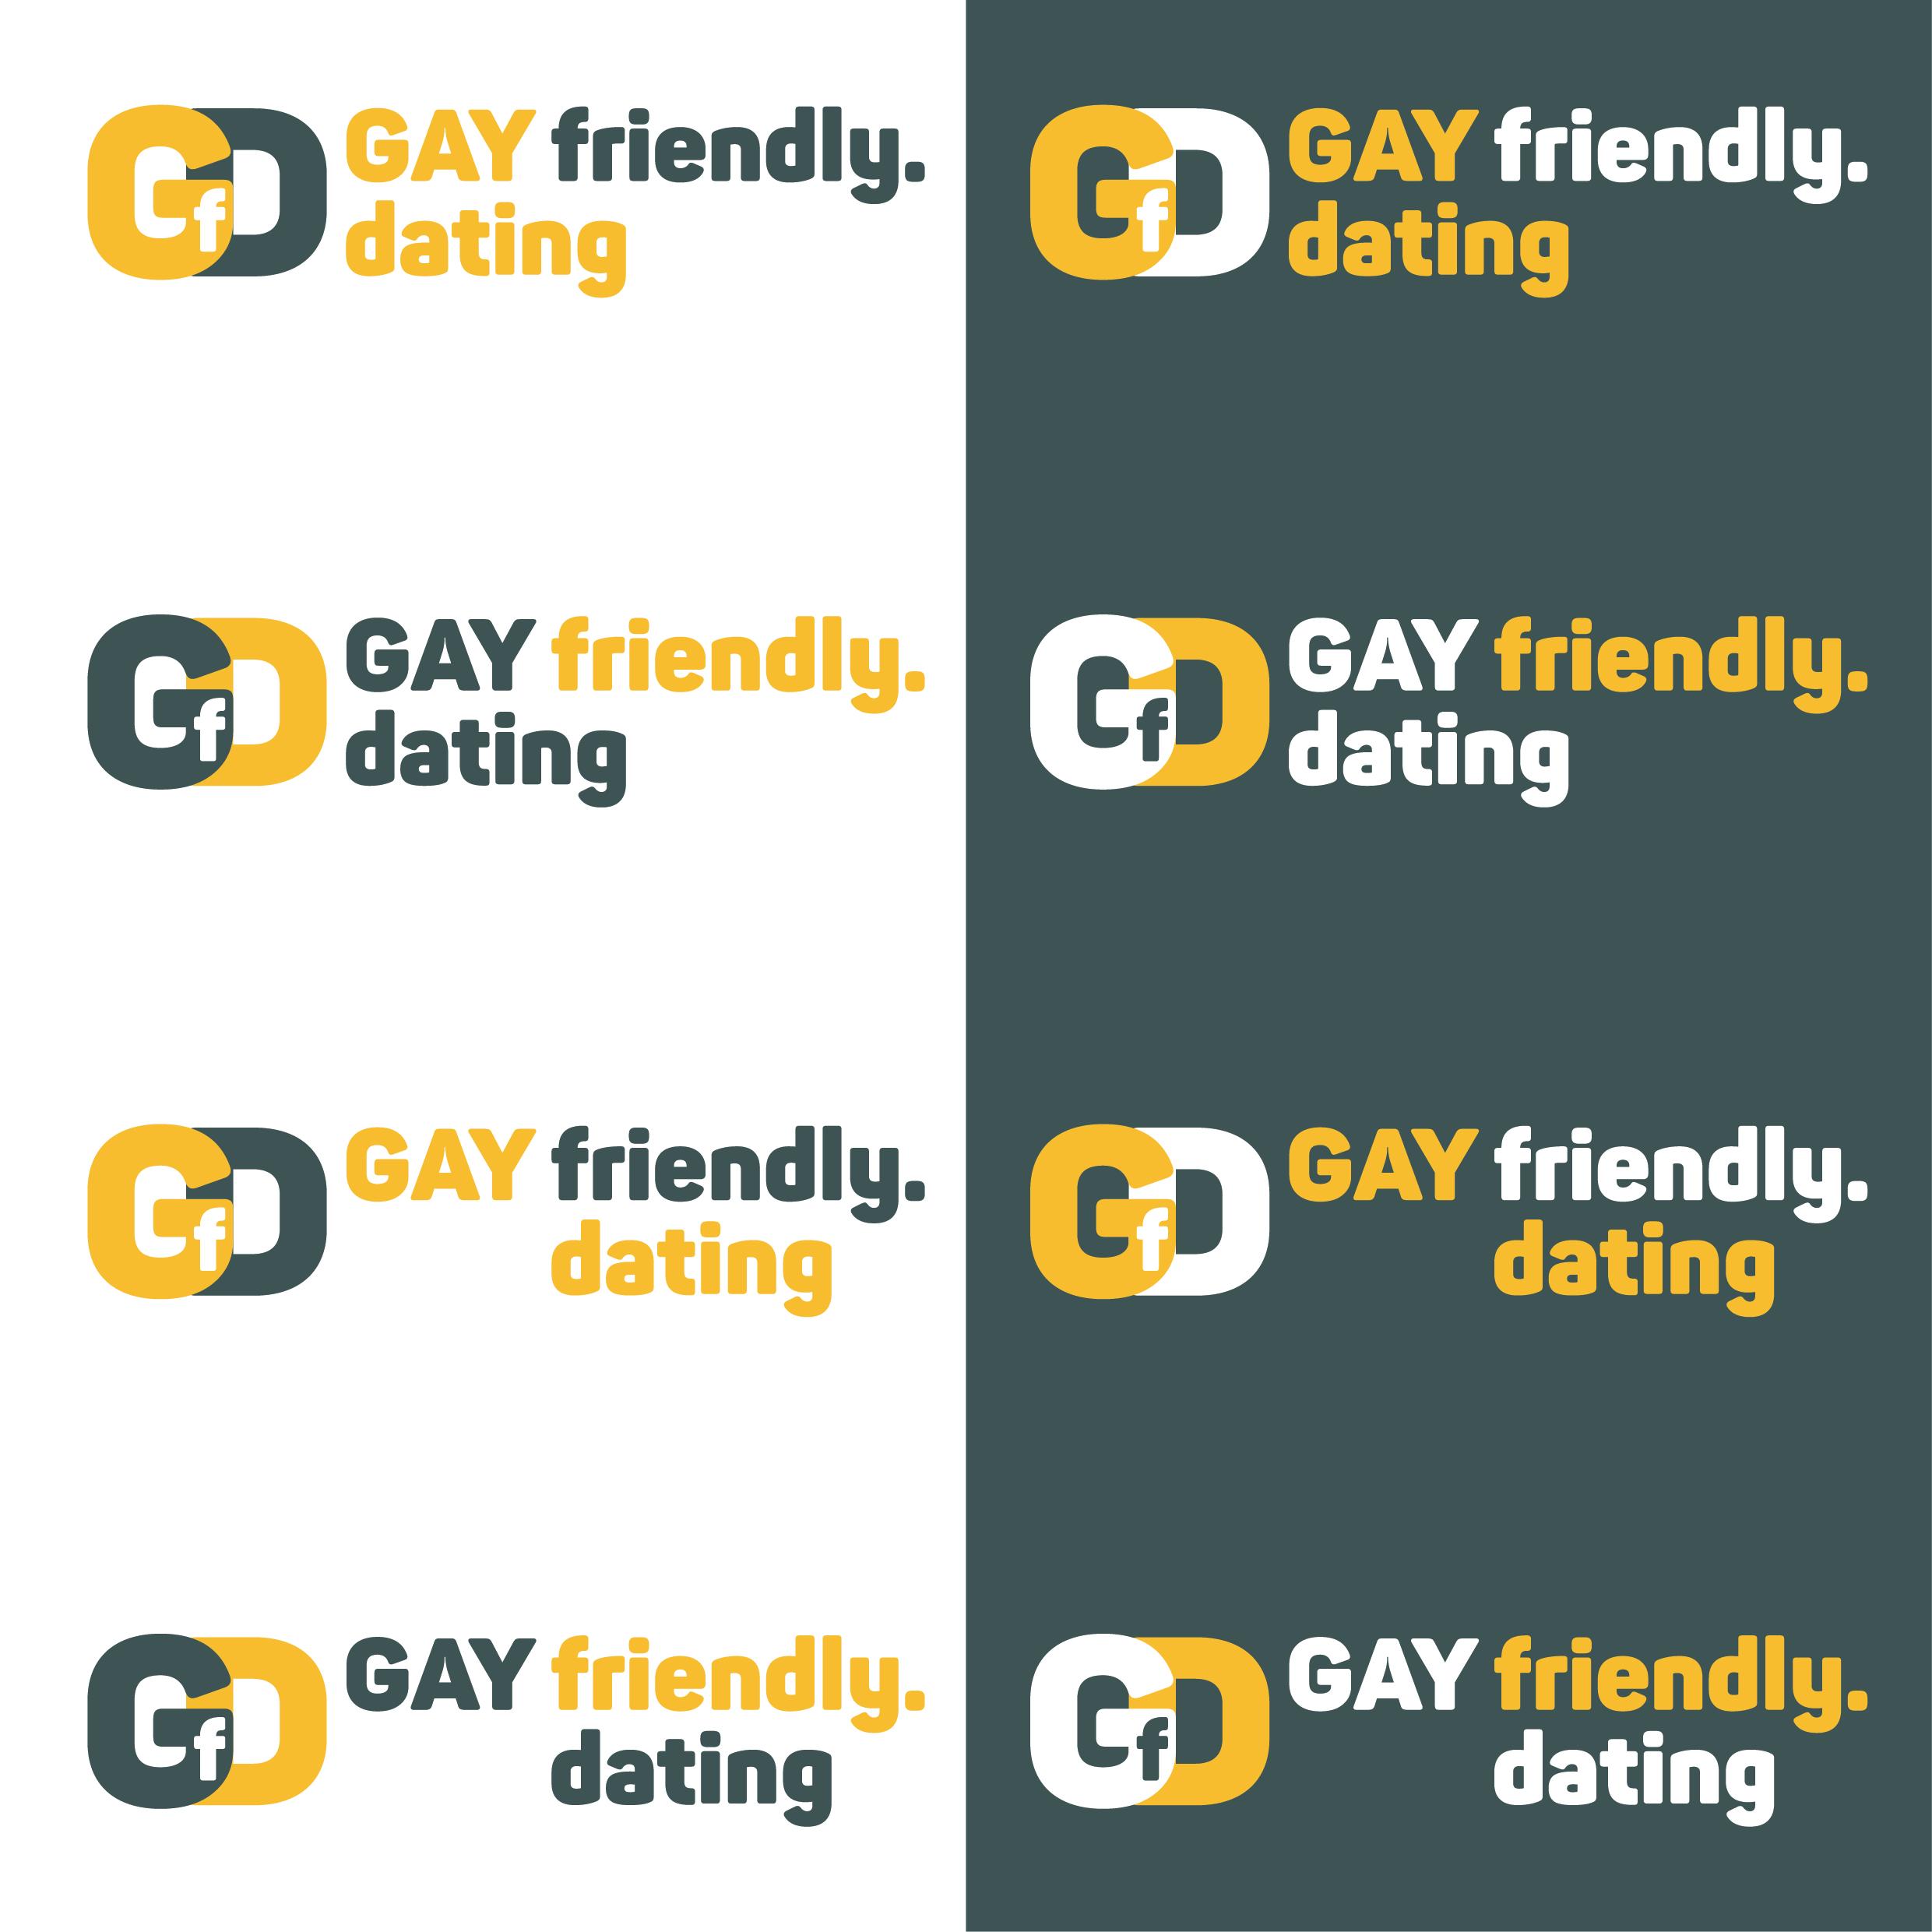 Разработать логотип для англоязычн. сайта знакомств для геев фото f_1565b47681f0bd03.jpg